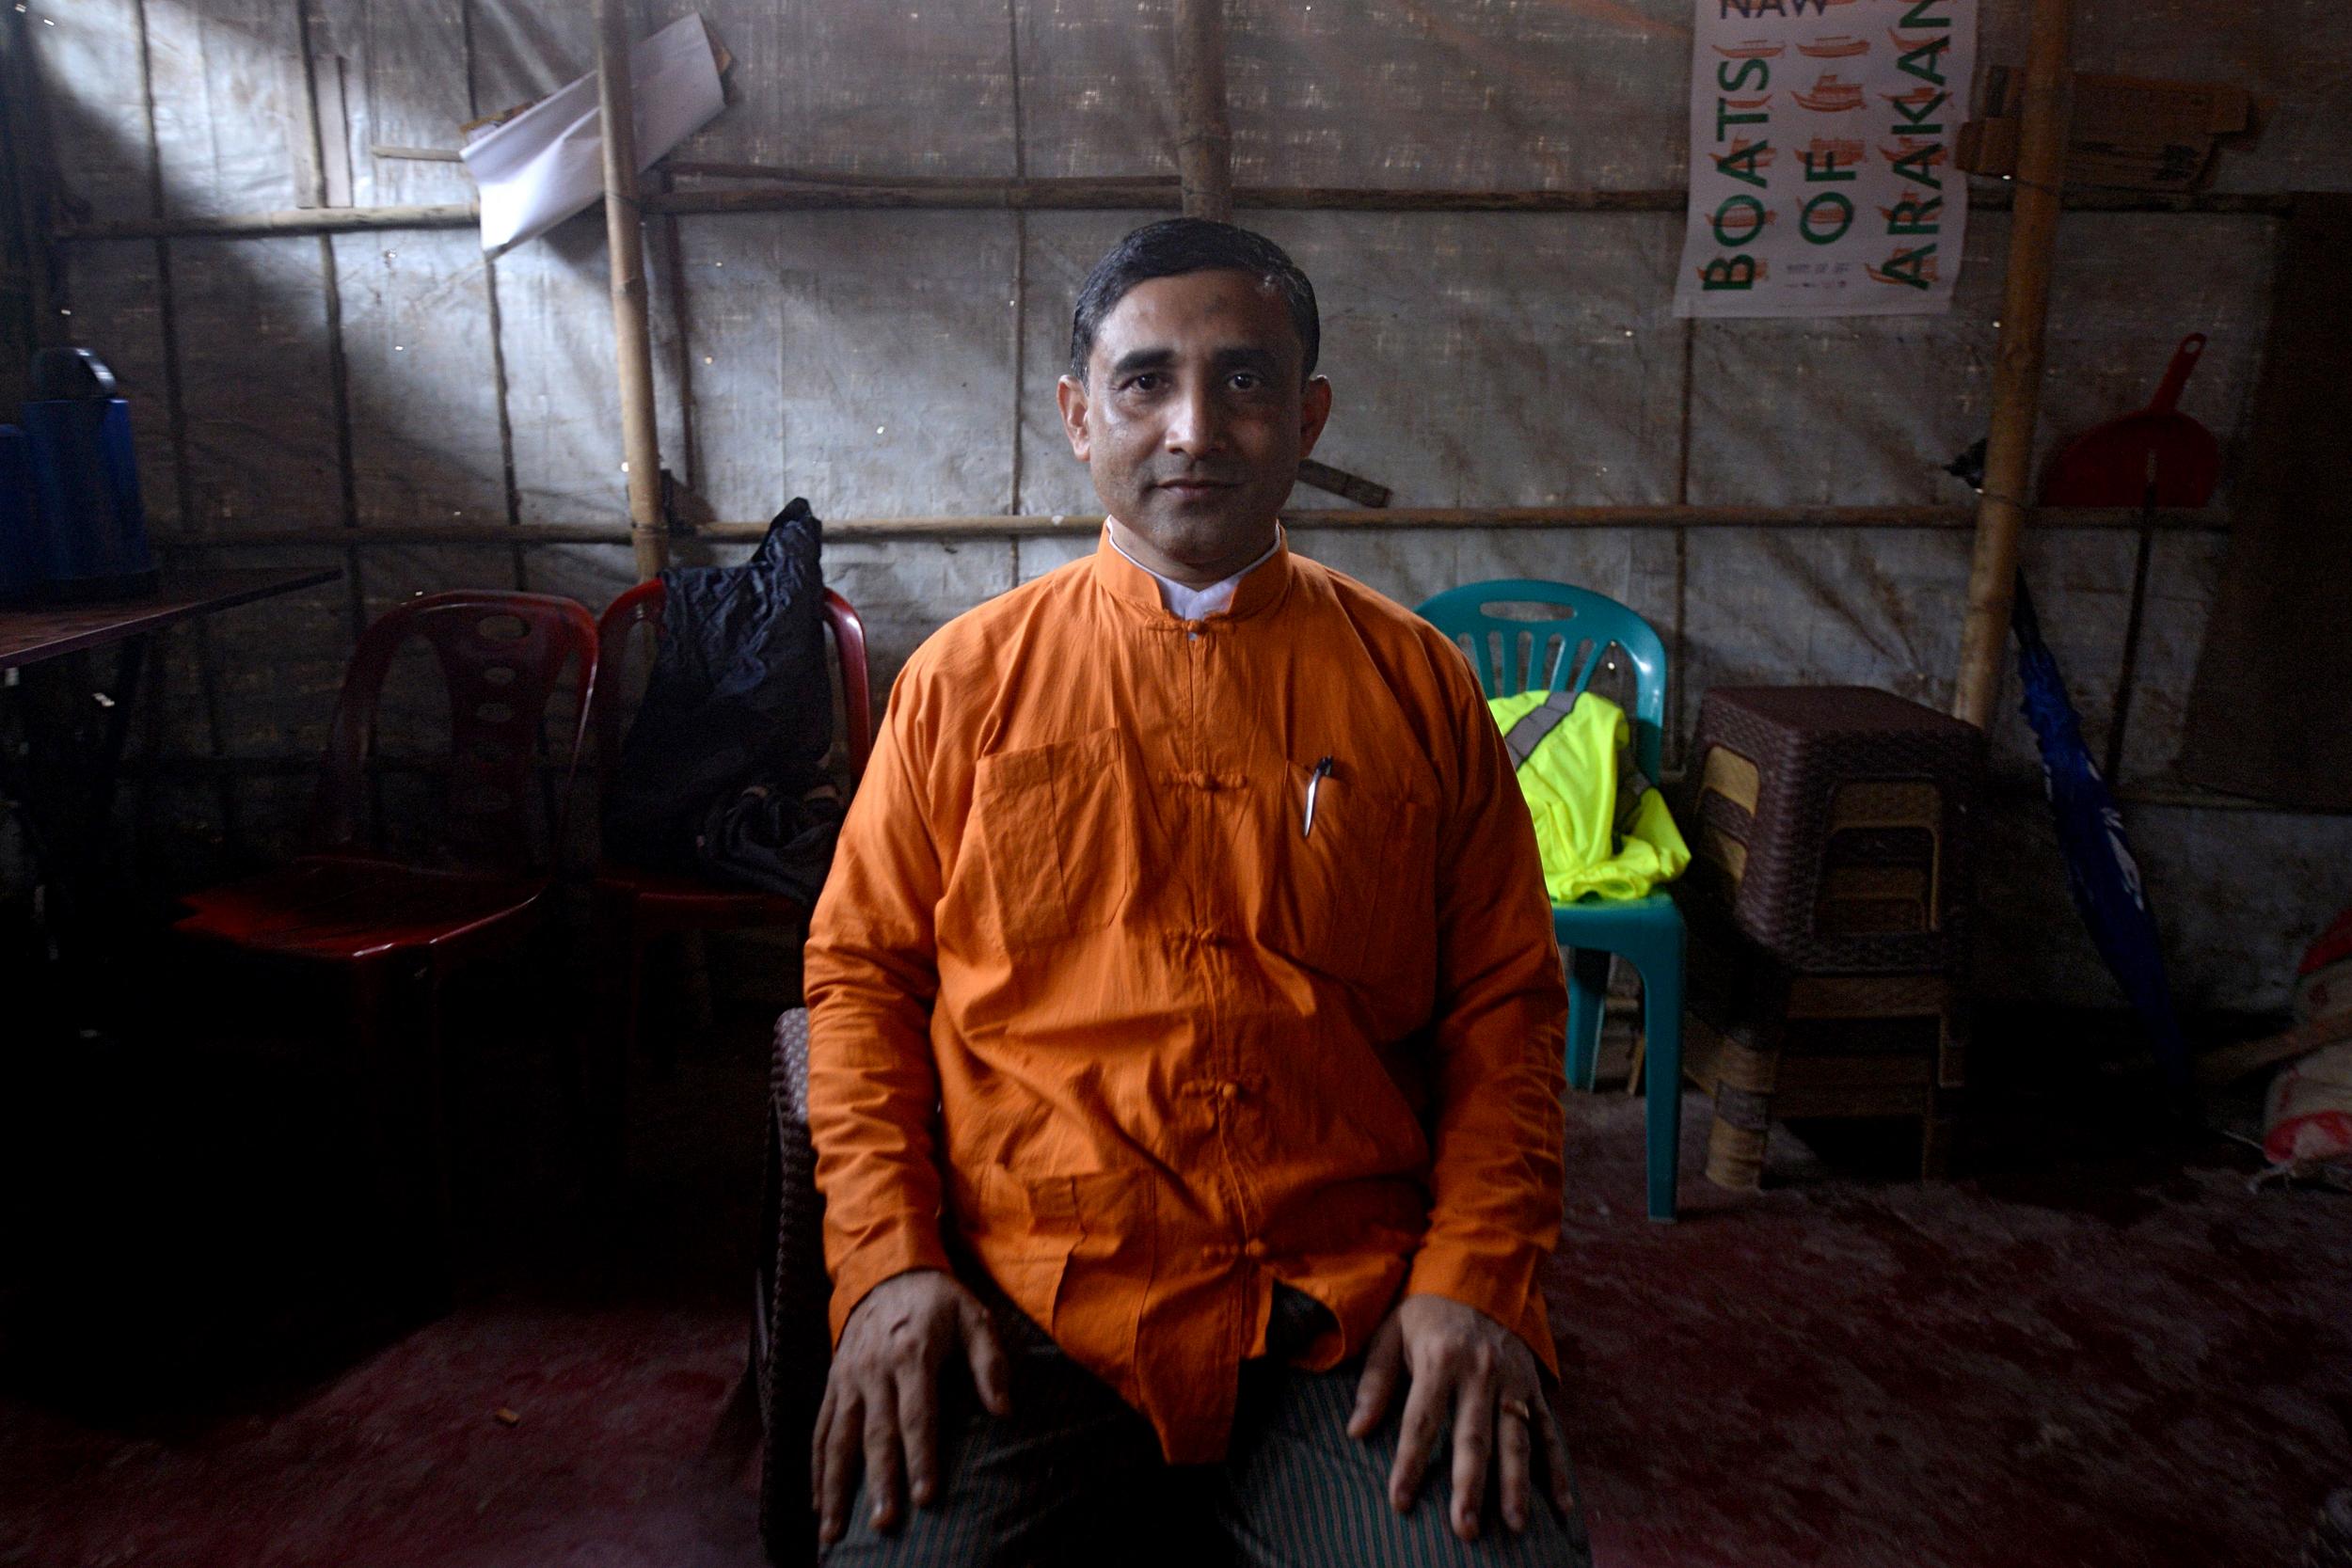 U.S. condemns killing of Rohingya leader, urges full probe